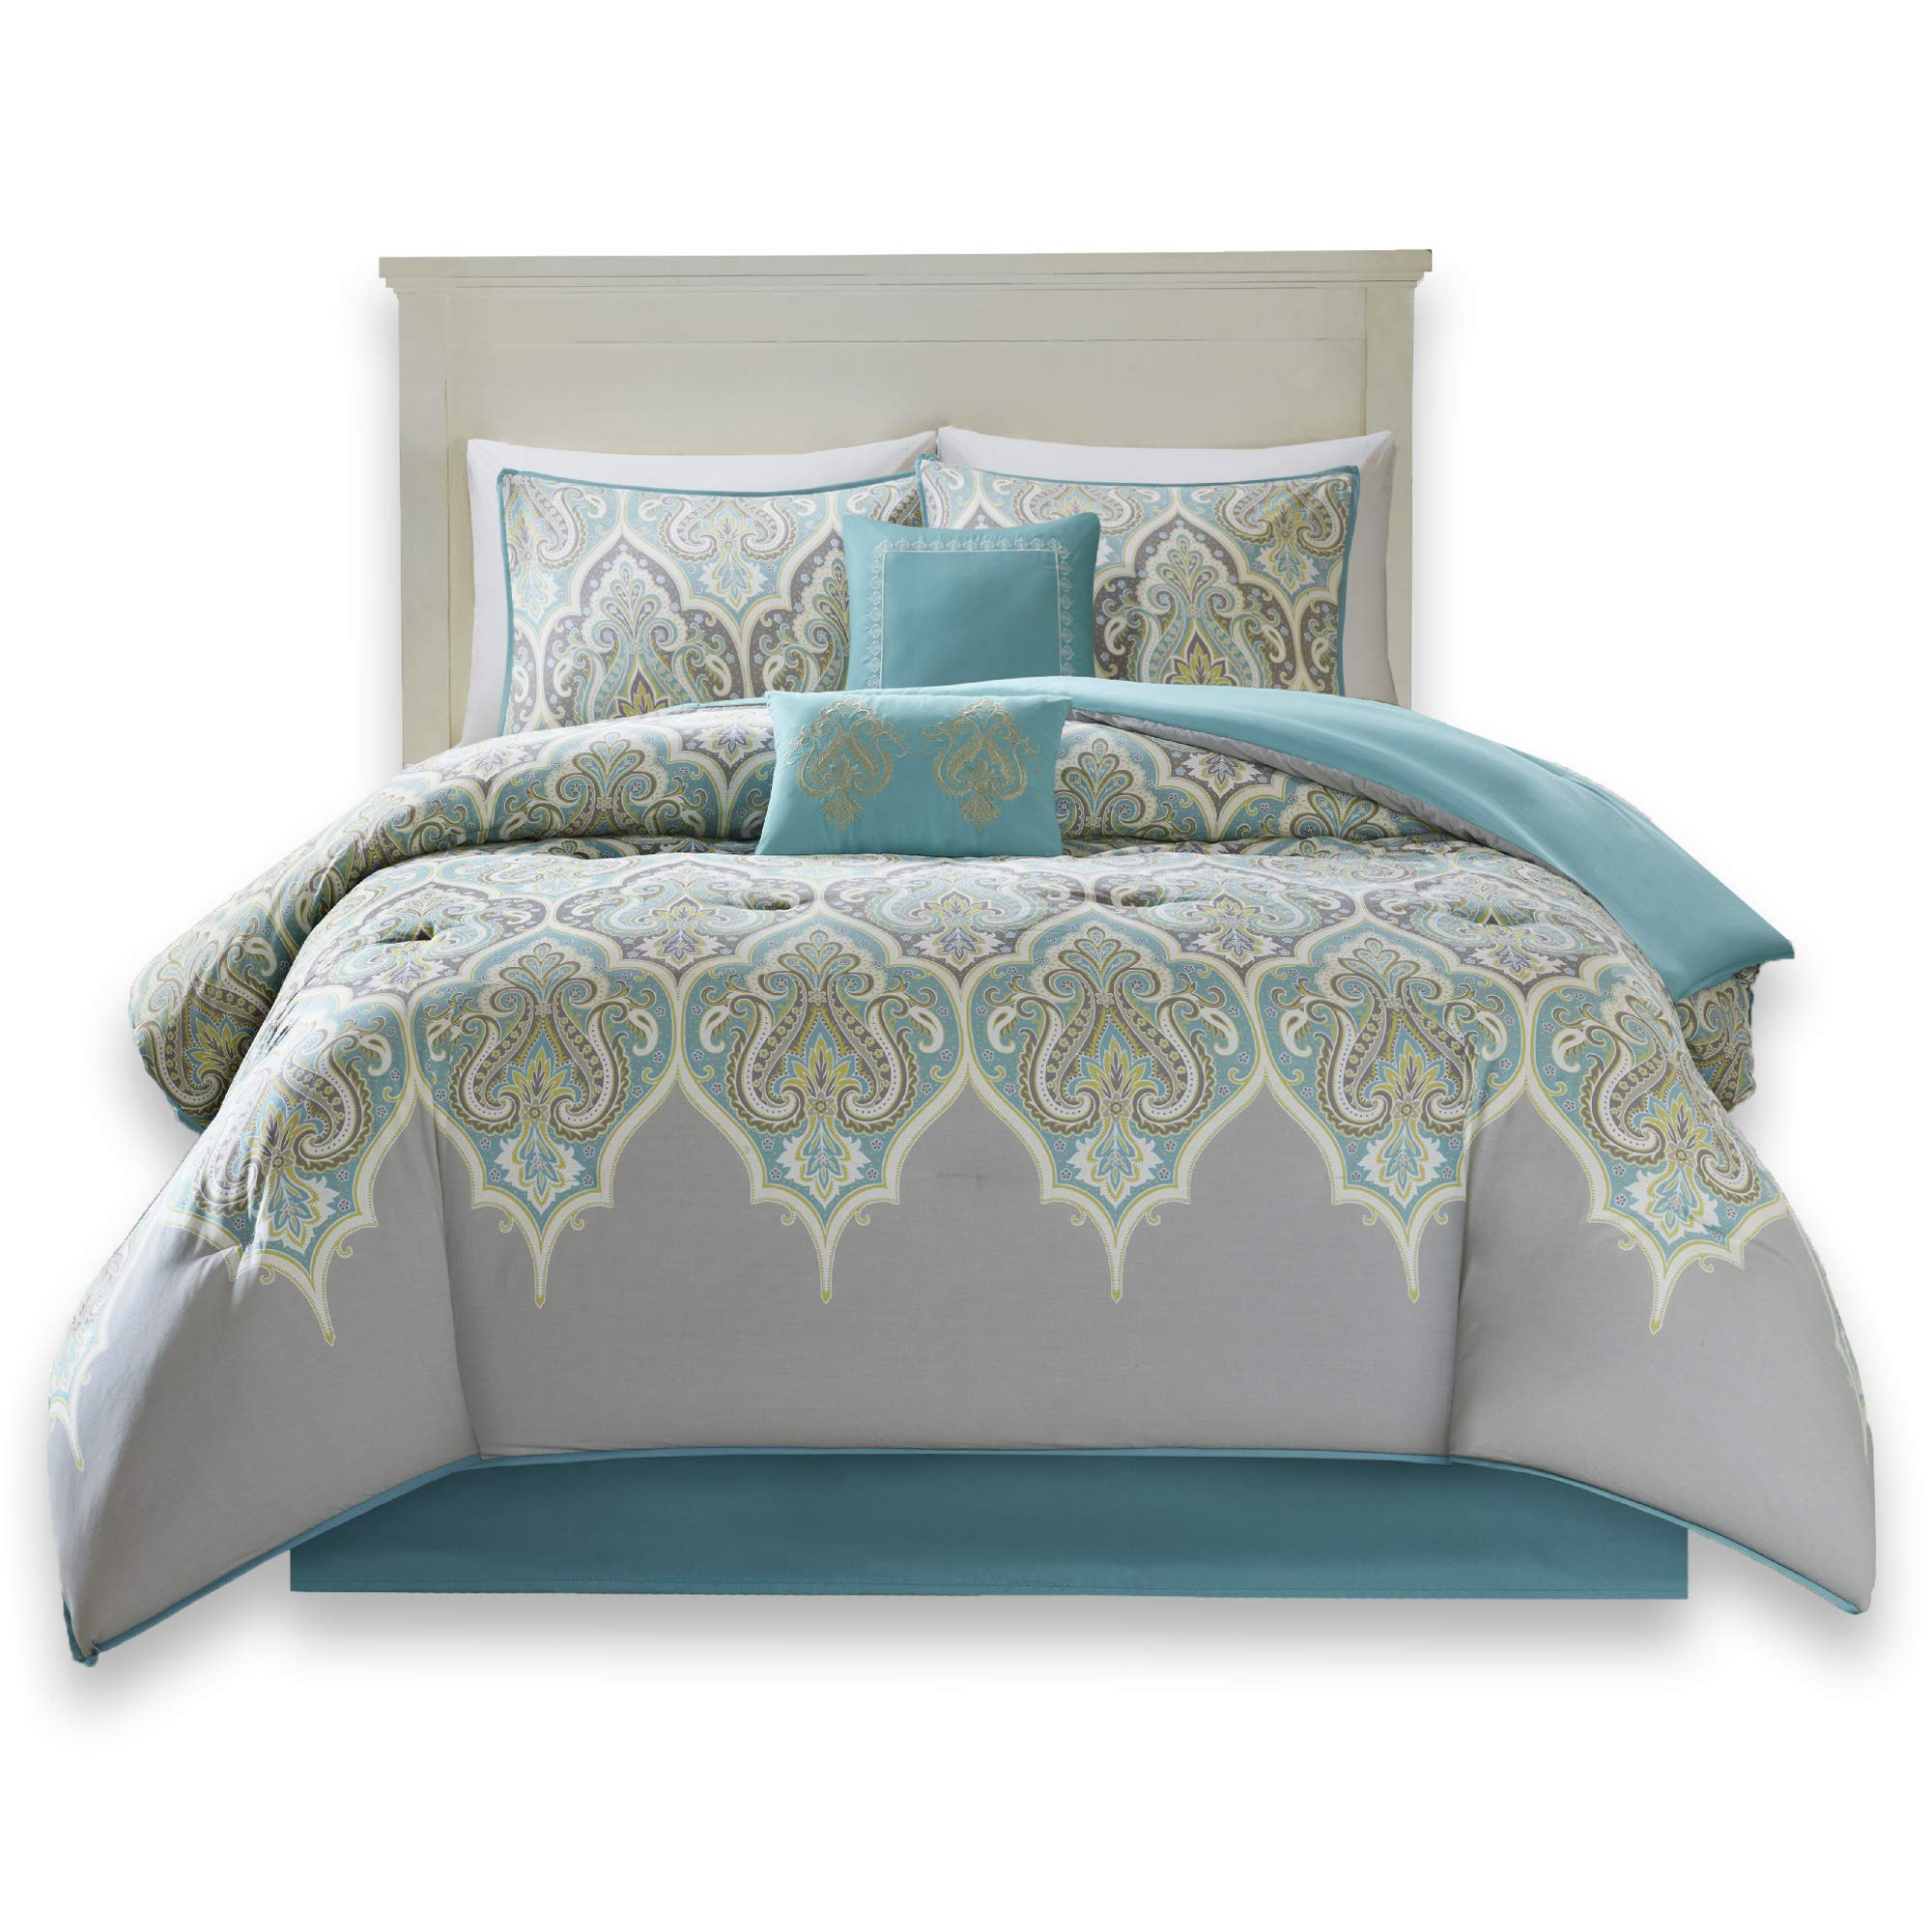 Comfort Spaces Mona 100 Cotton Printed Paisley Design 6